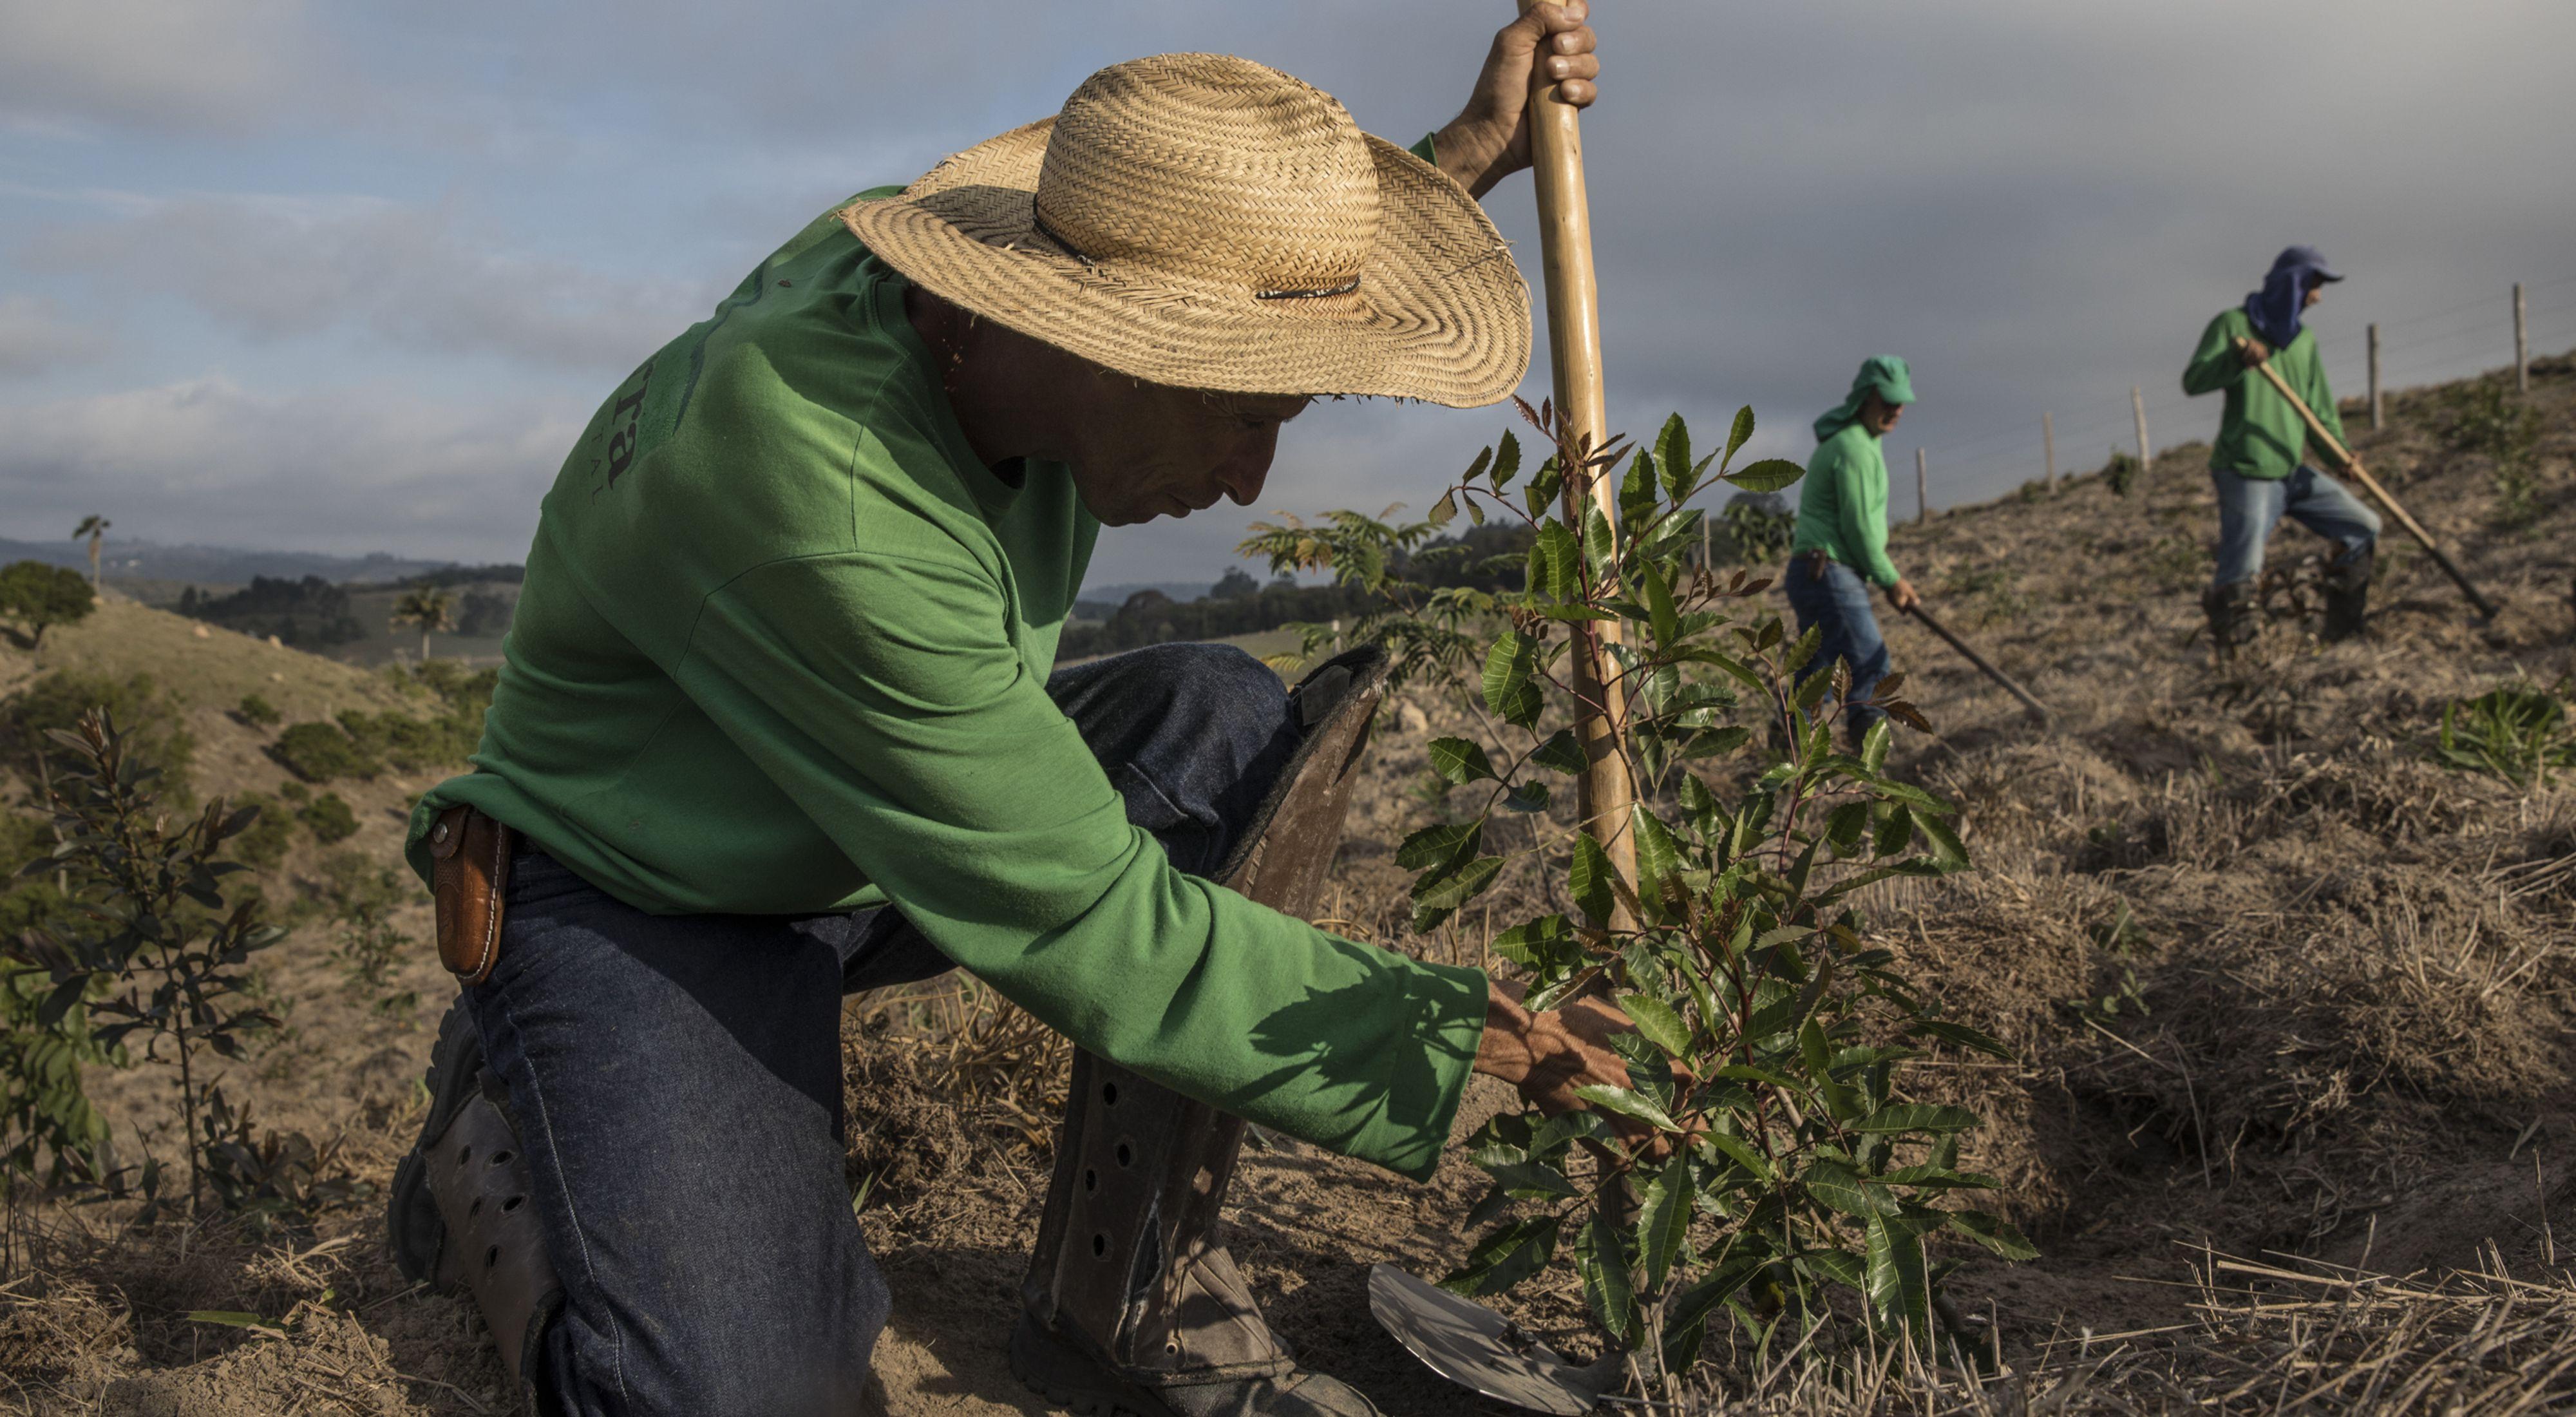 A man plants a tree seedling in the Mantiqueira region in Brazil